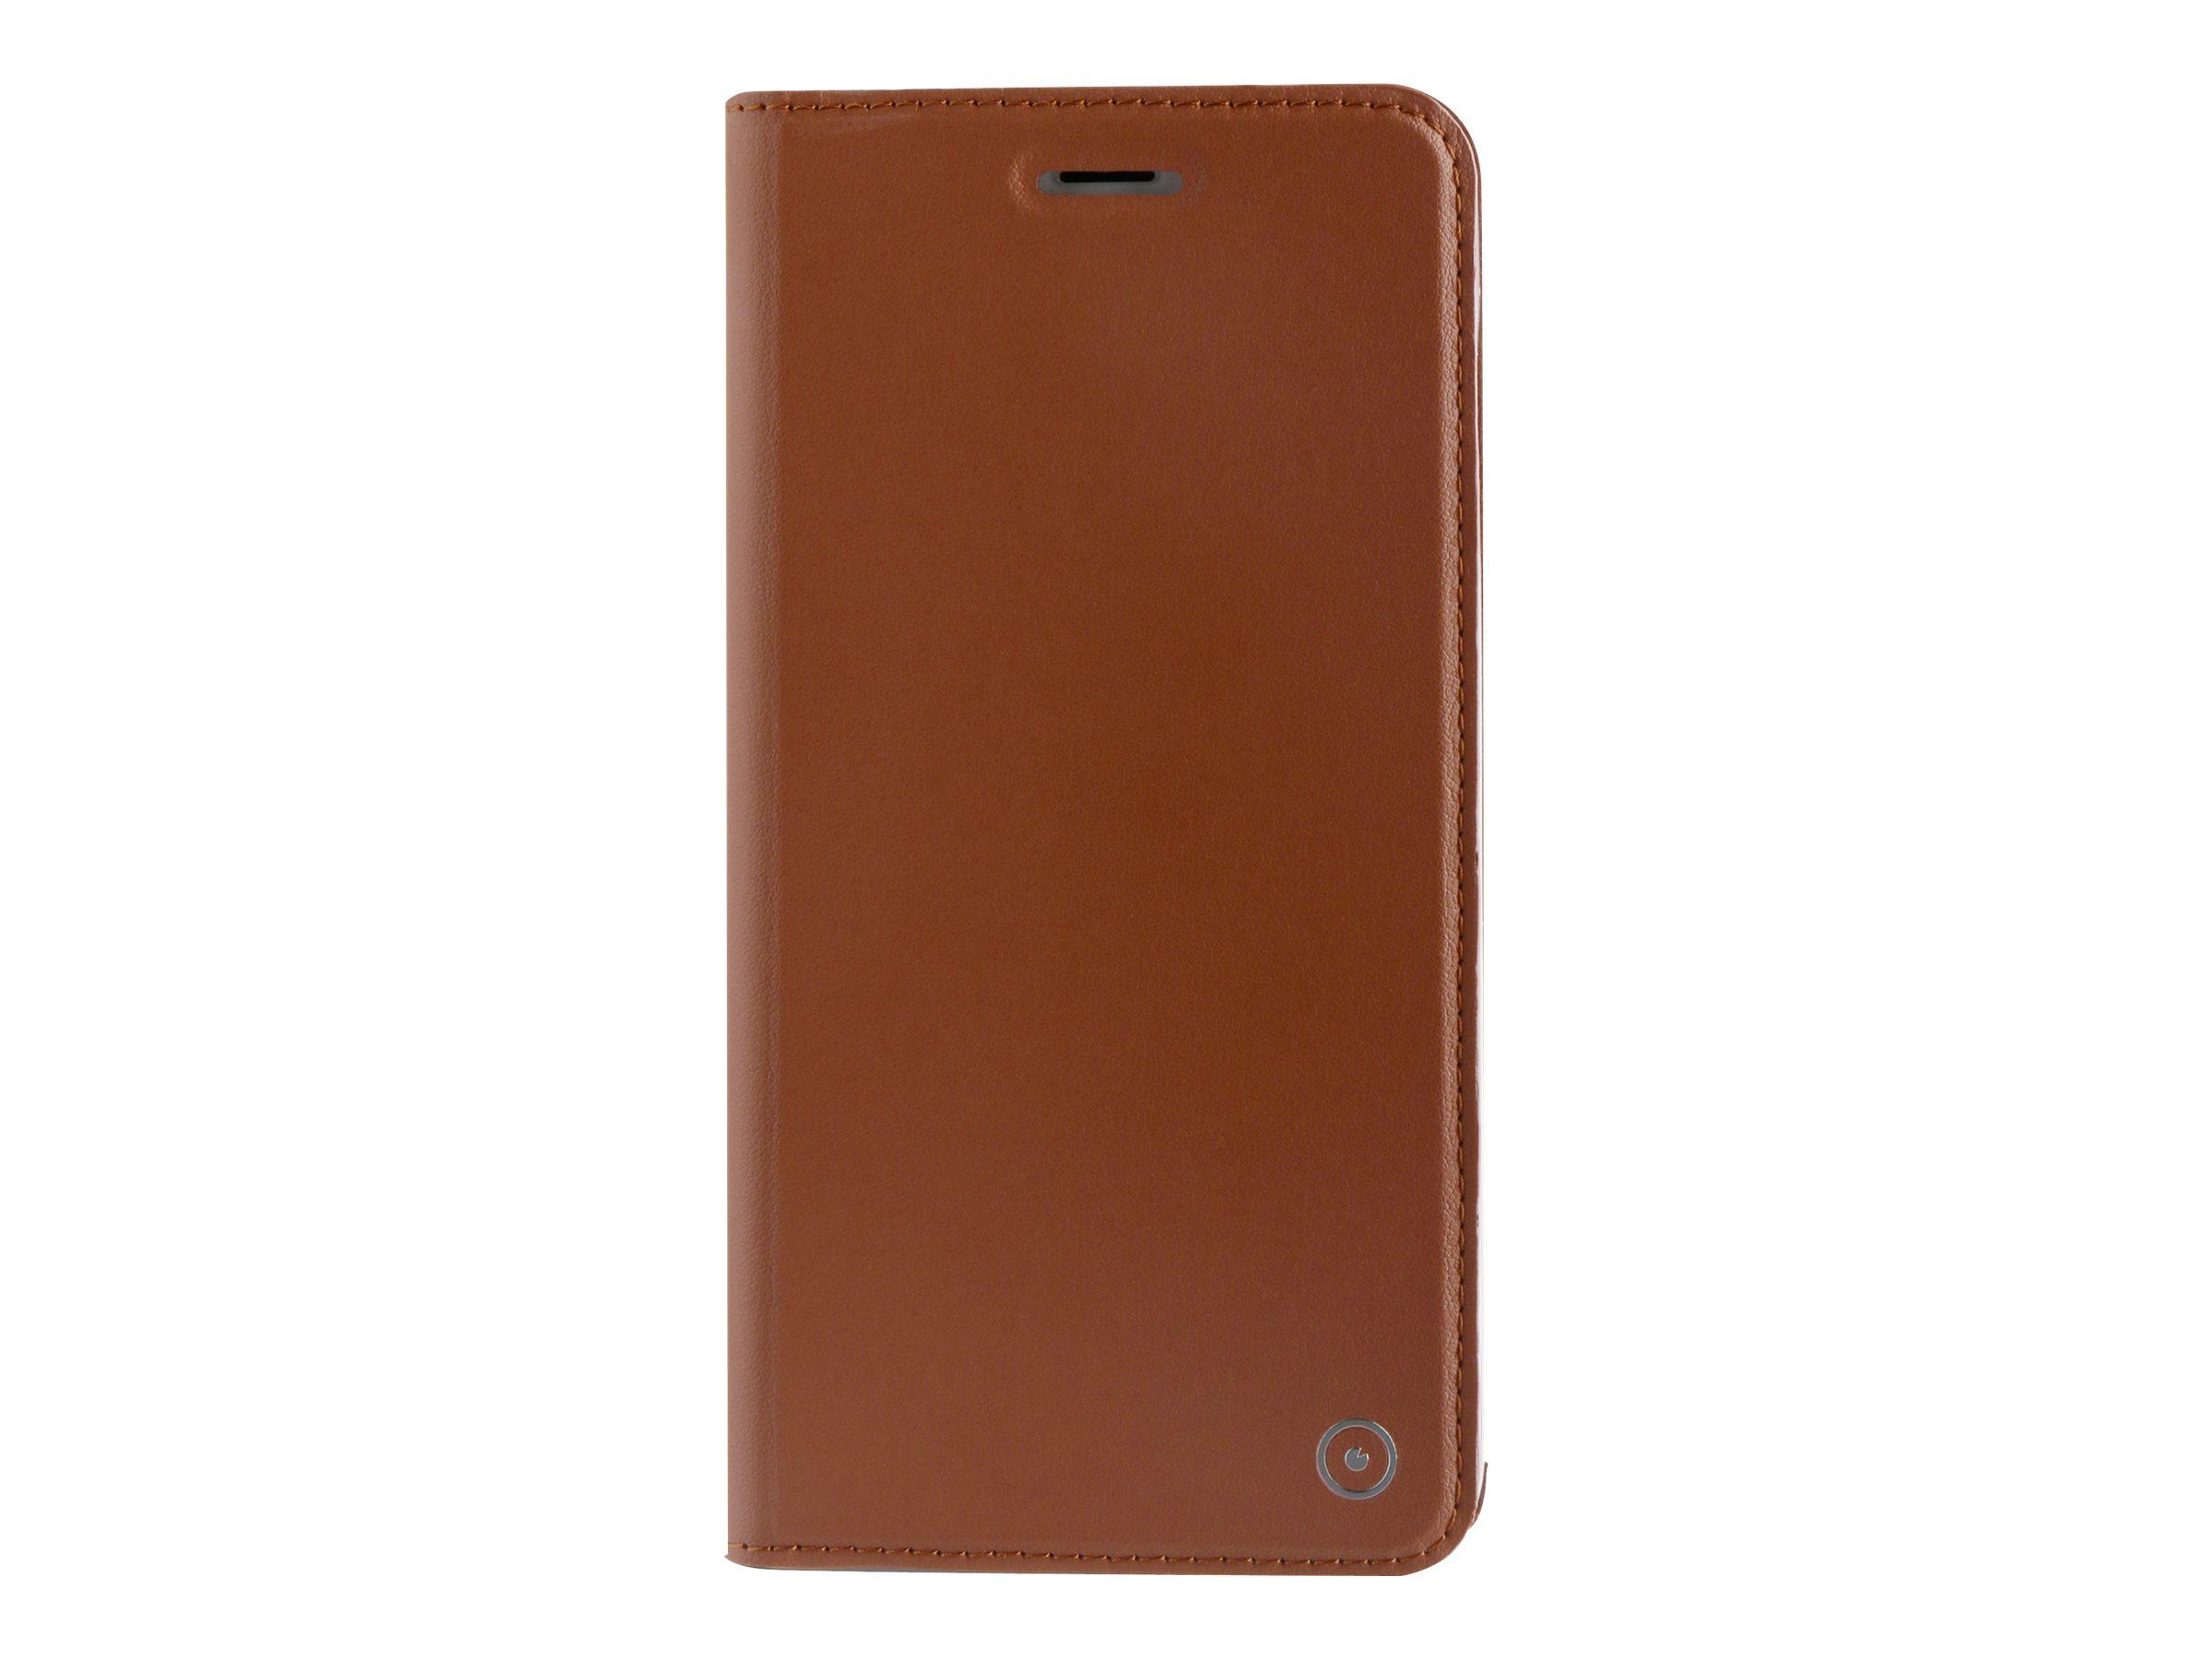 Muvit Folio Stand - Protection à rabat pour iPhone 7 Plus - brun